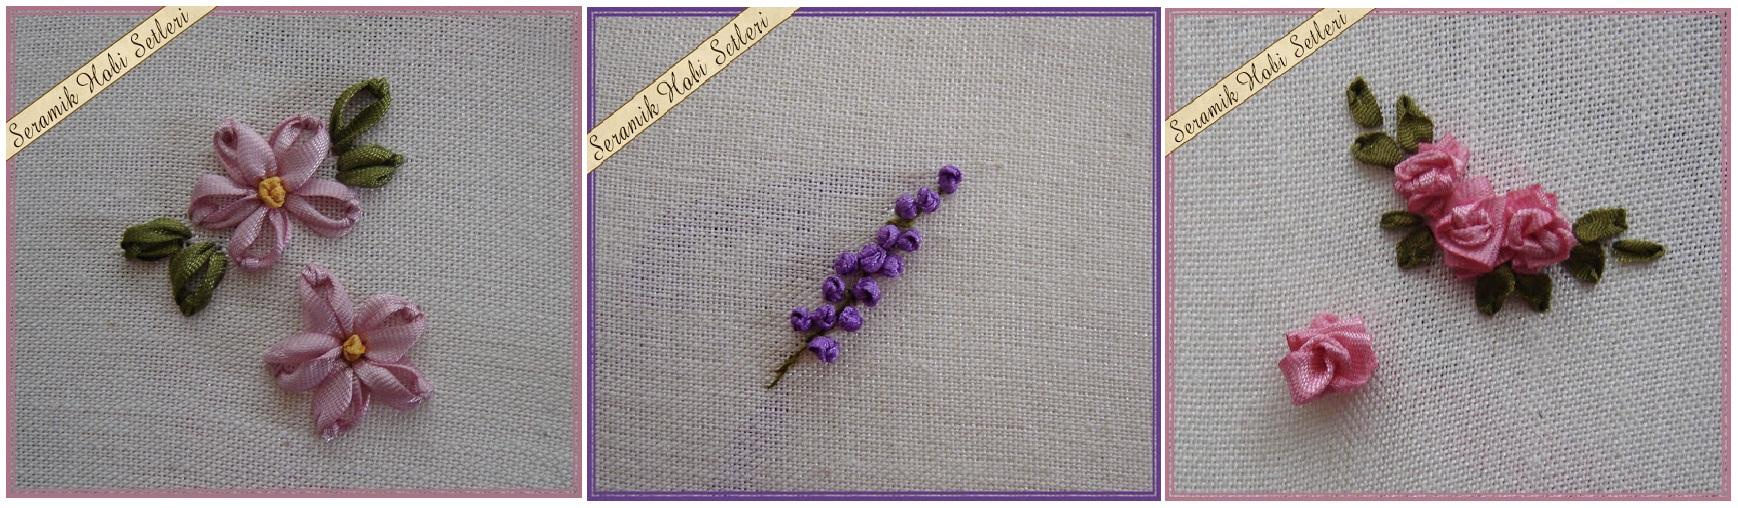 Уроки вышивки лентами цветов